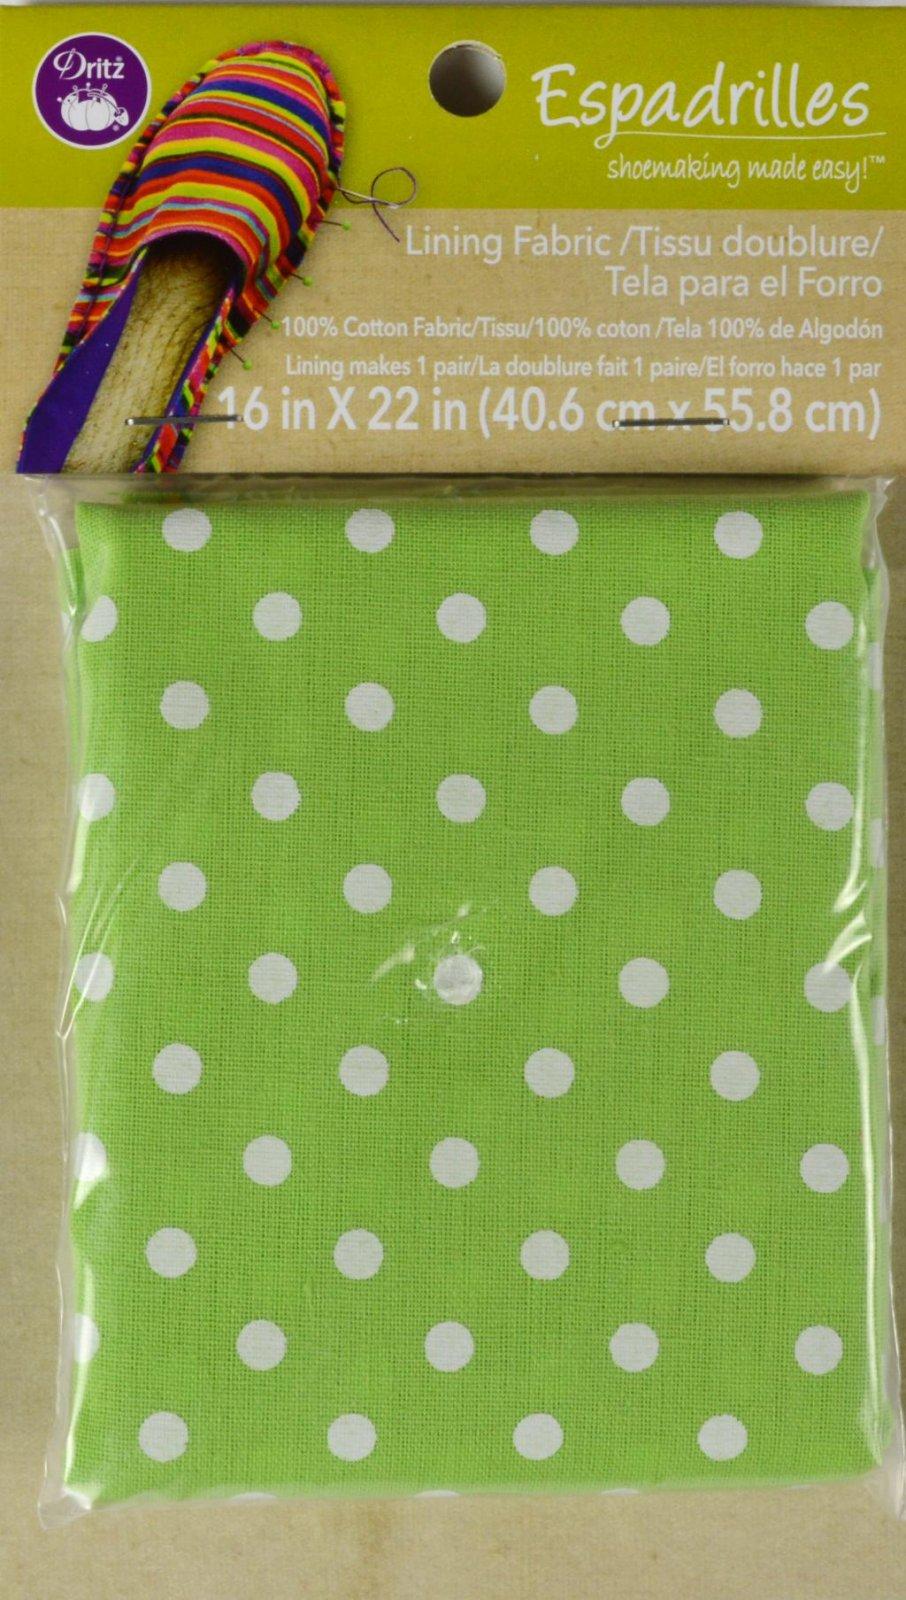 Espadrilles Lining Fabric Green